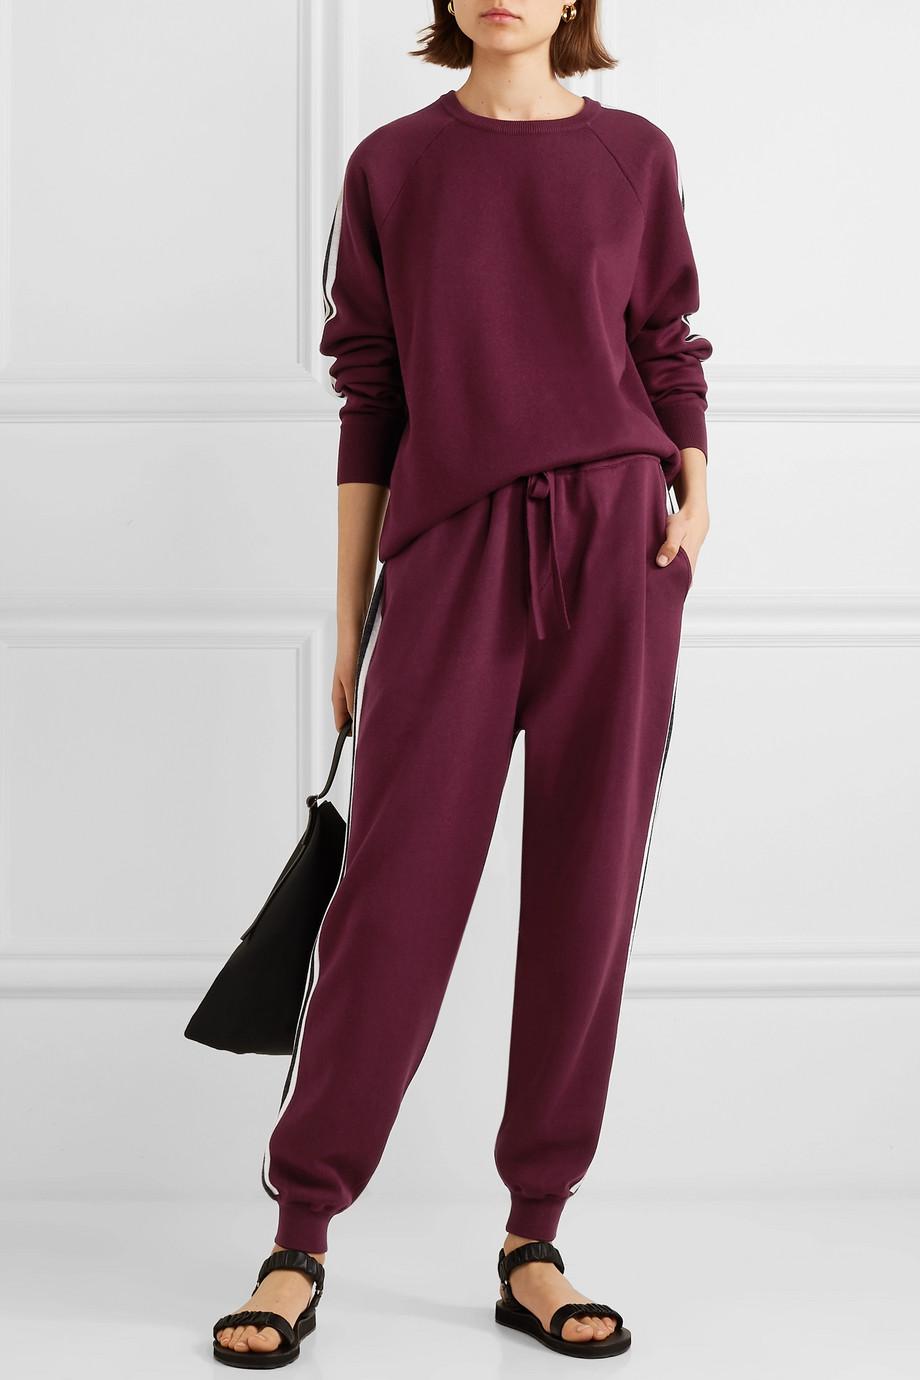 Olivia von Halle Missy Bordeaux 条纹真丝羊绒混纺卫衣休闲裤套装